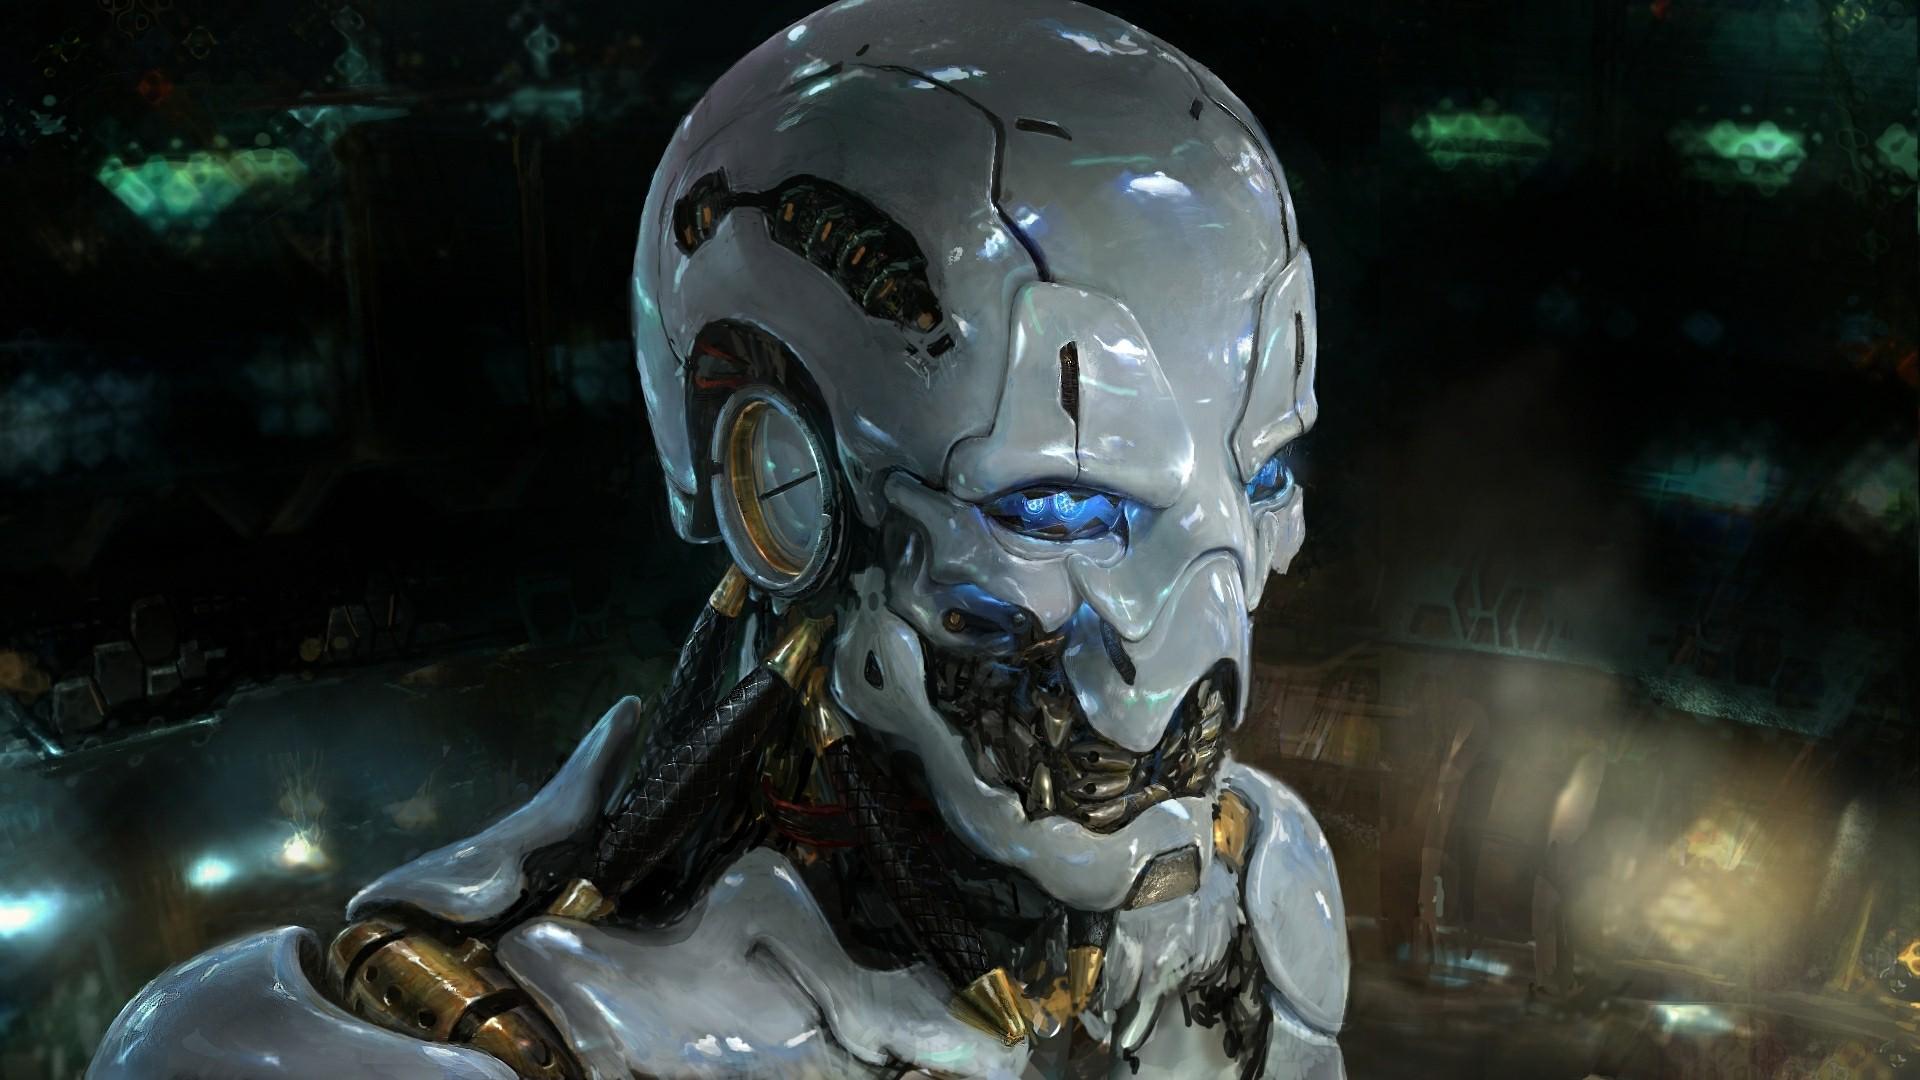 Cyborg Wallpaper Pic